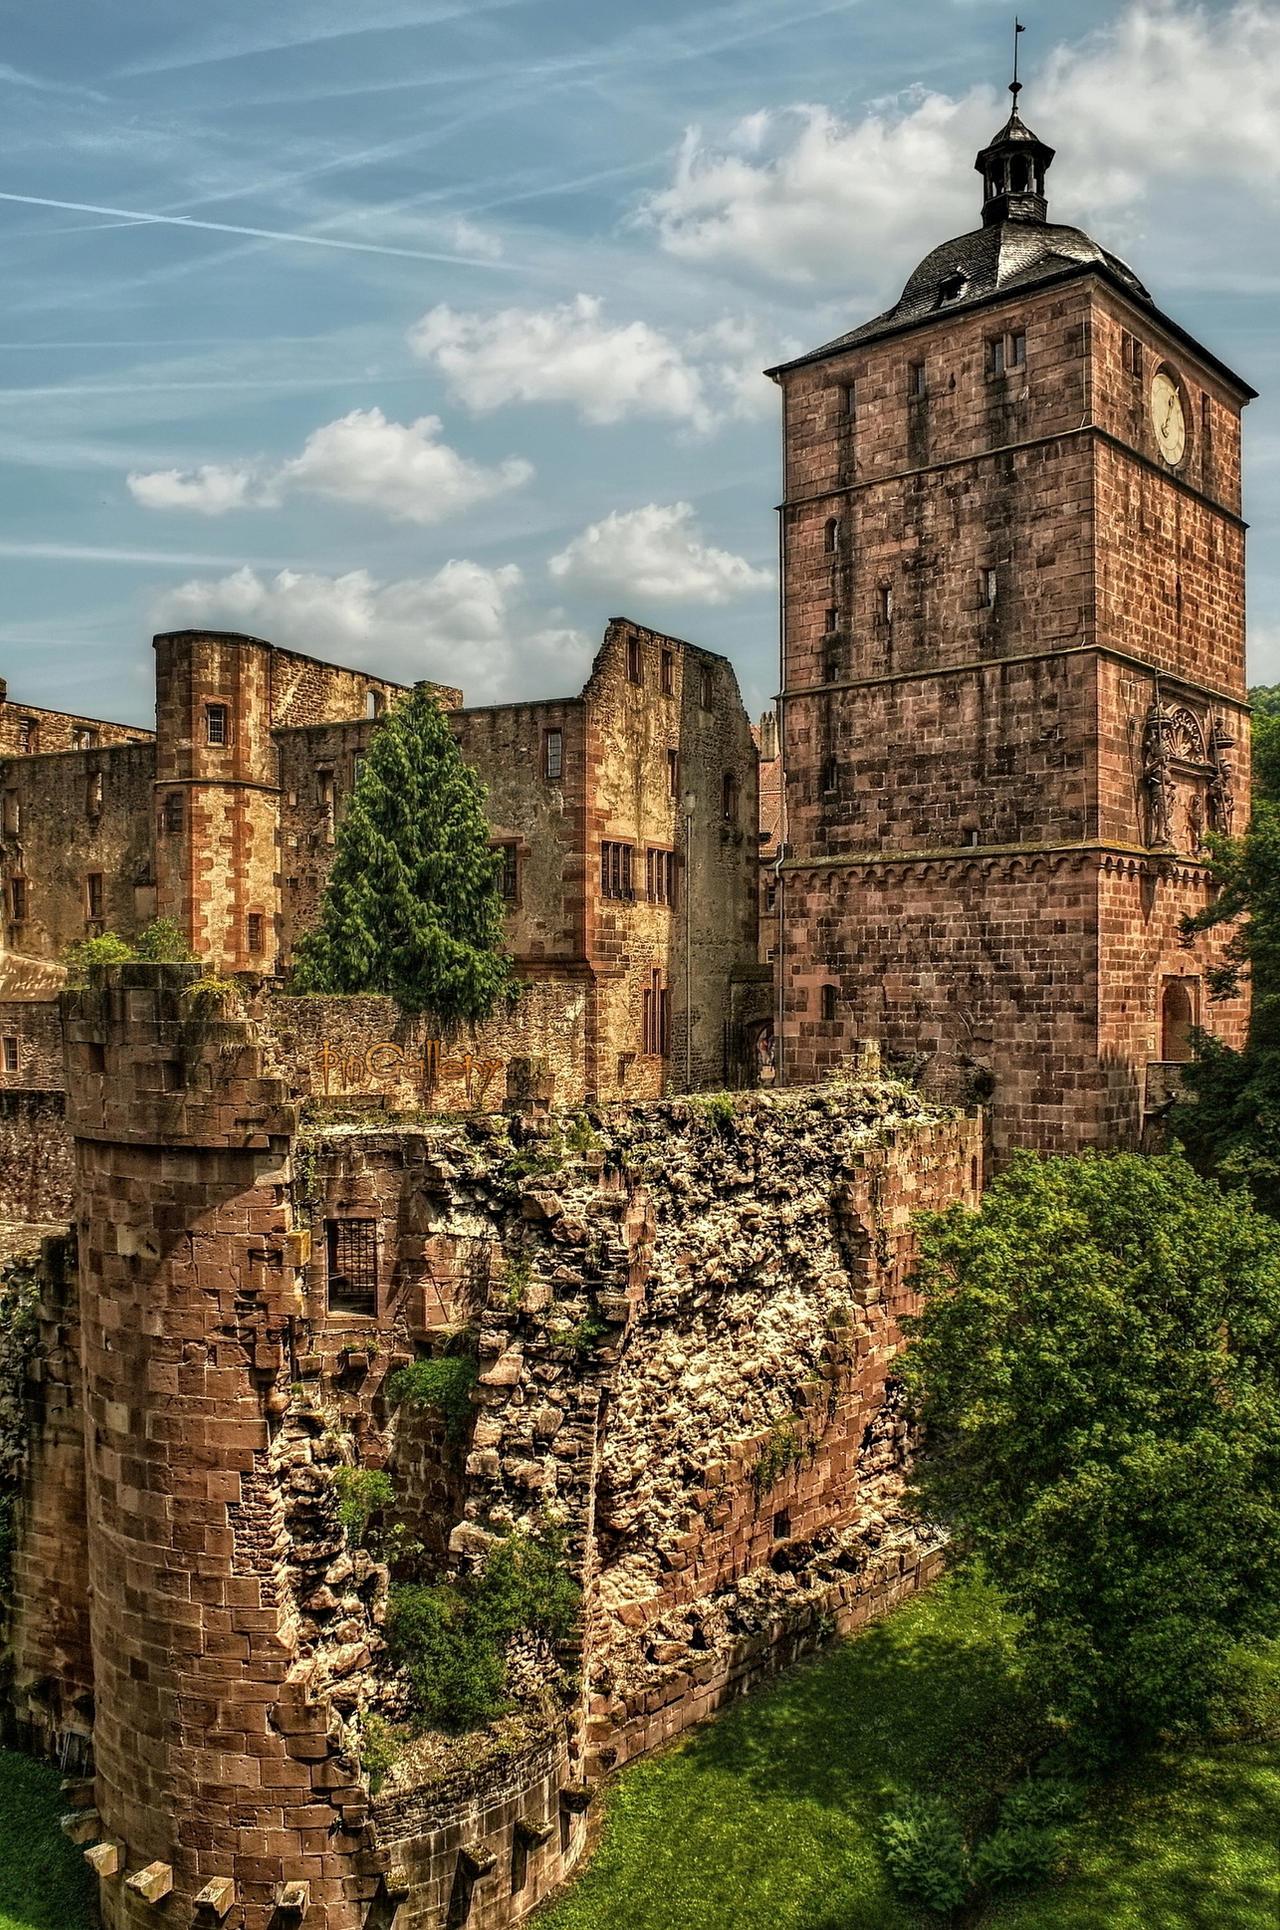 Castle Ruins in Heidelberg I